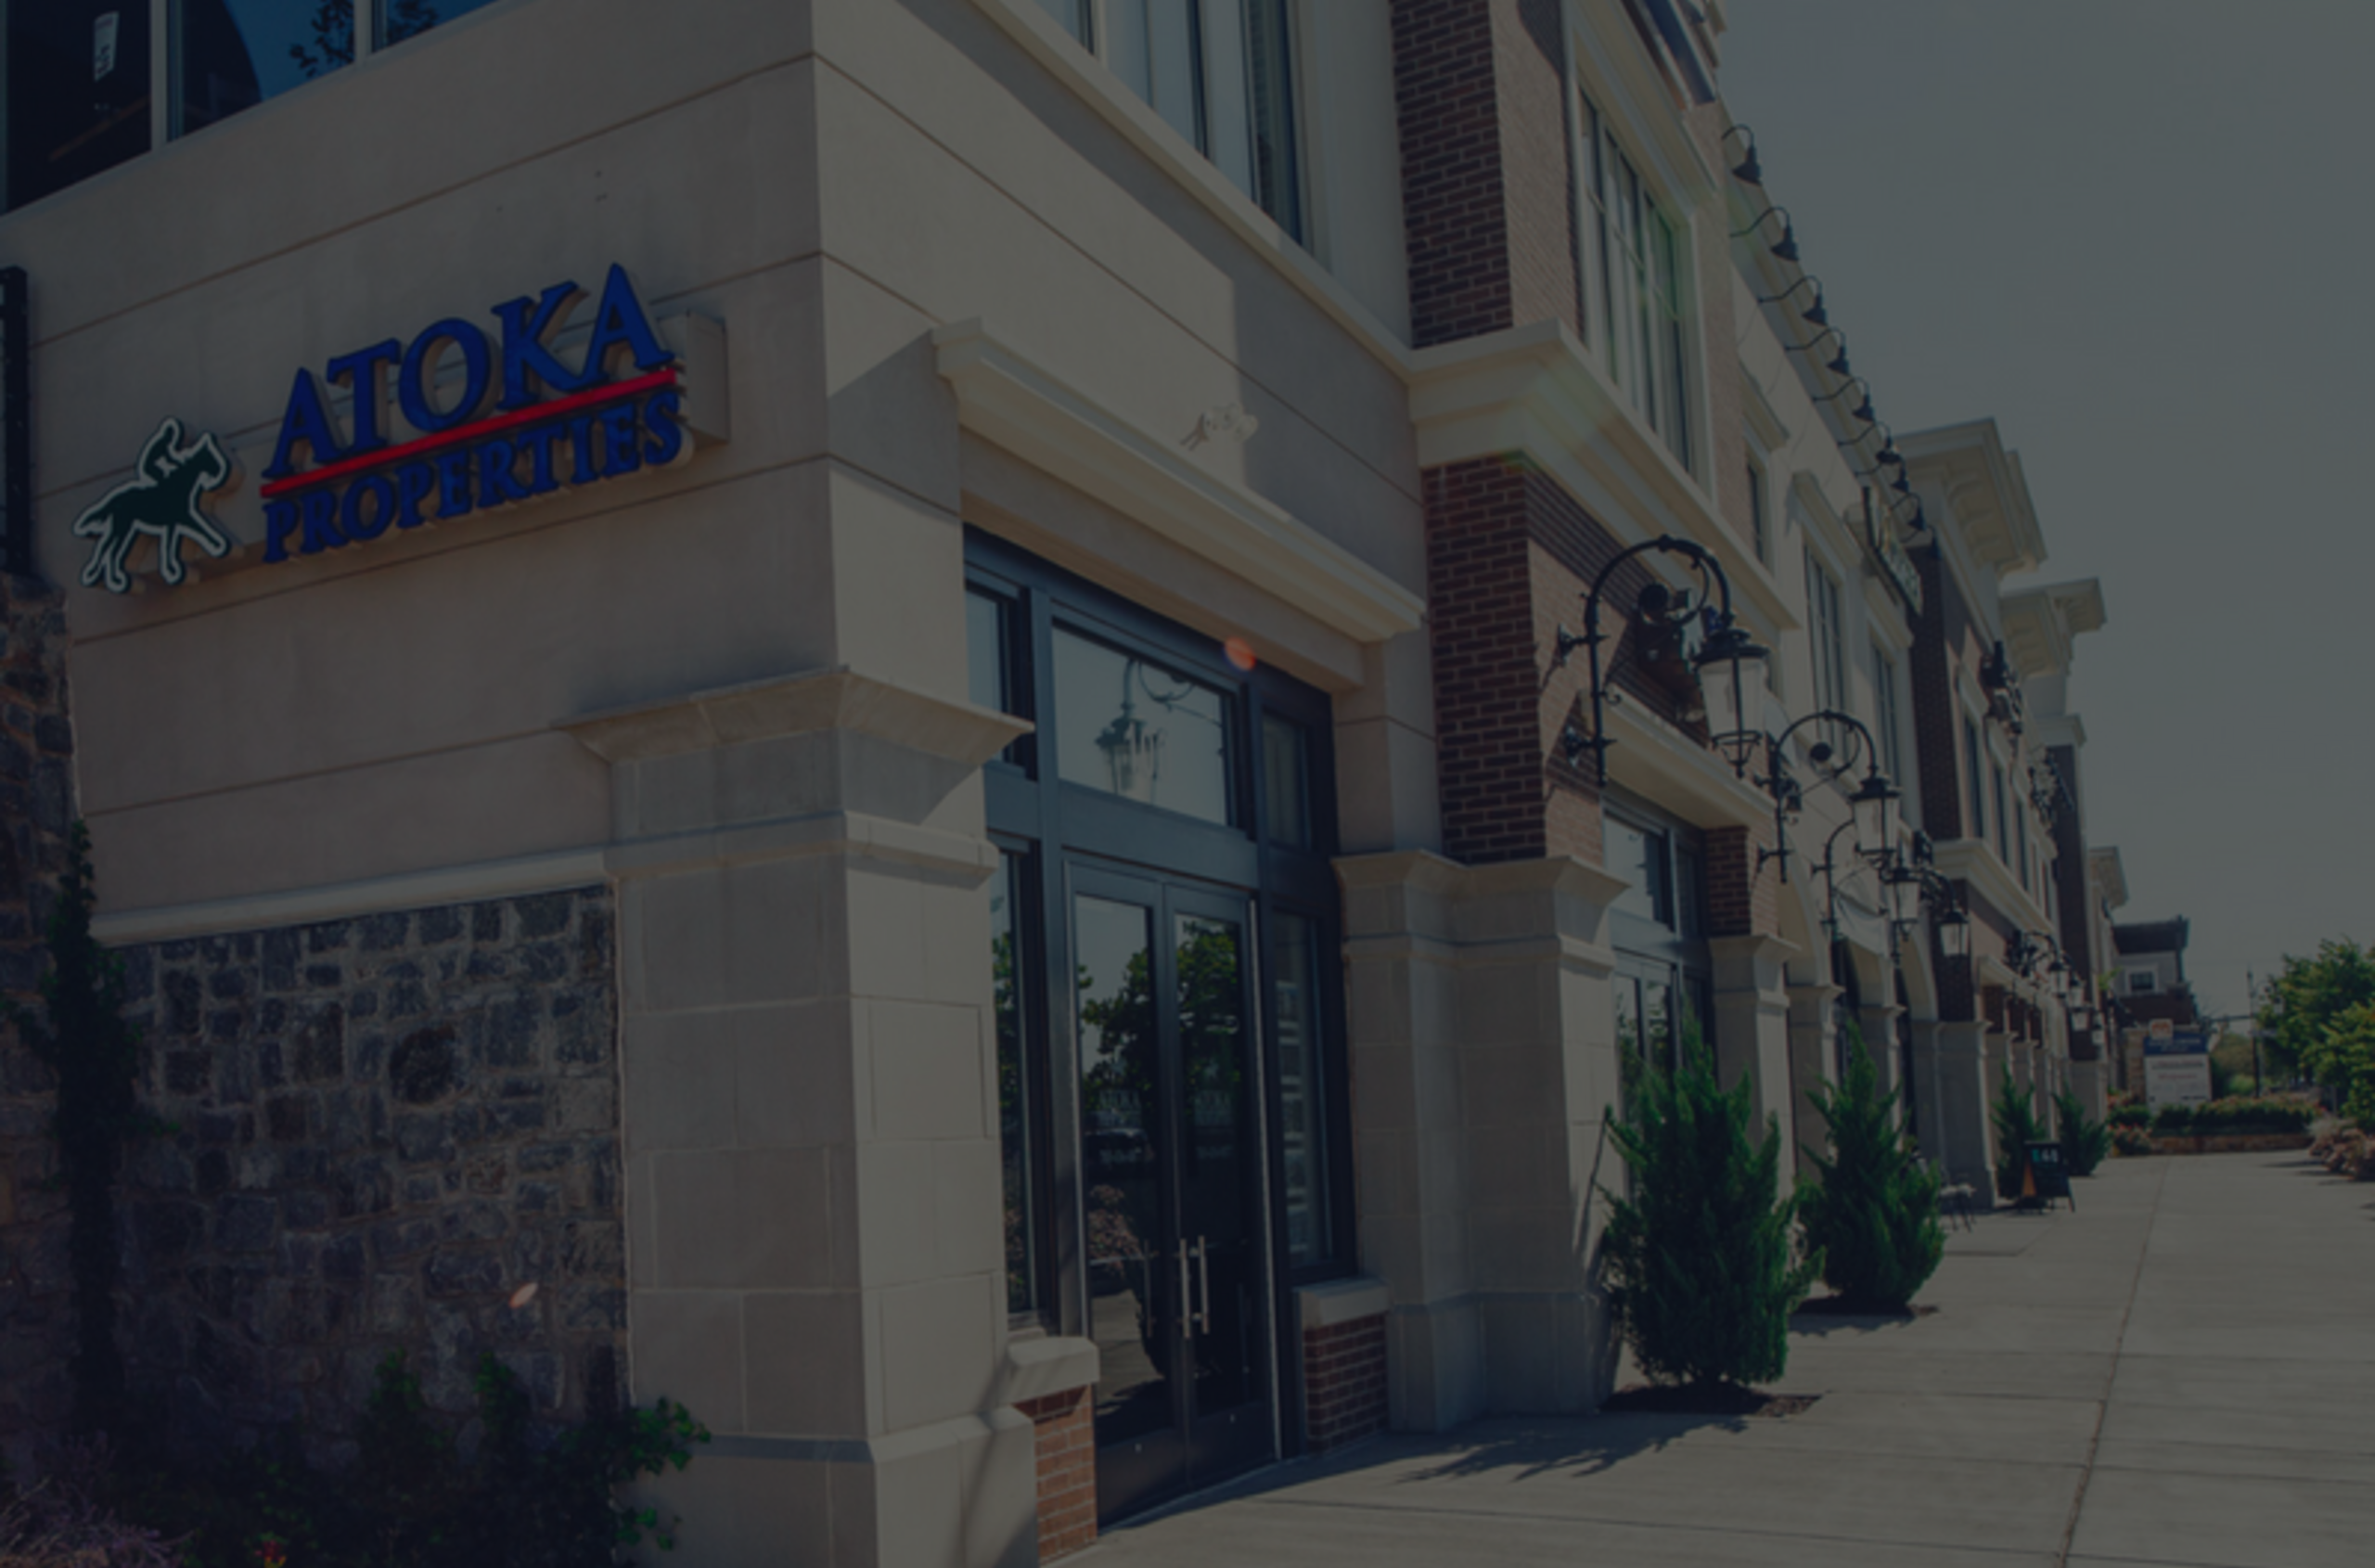 2018 Loudoun's Favorites Winners! Atoka Properties 